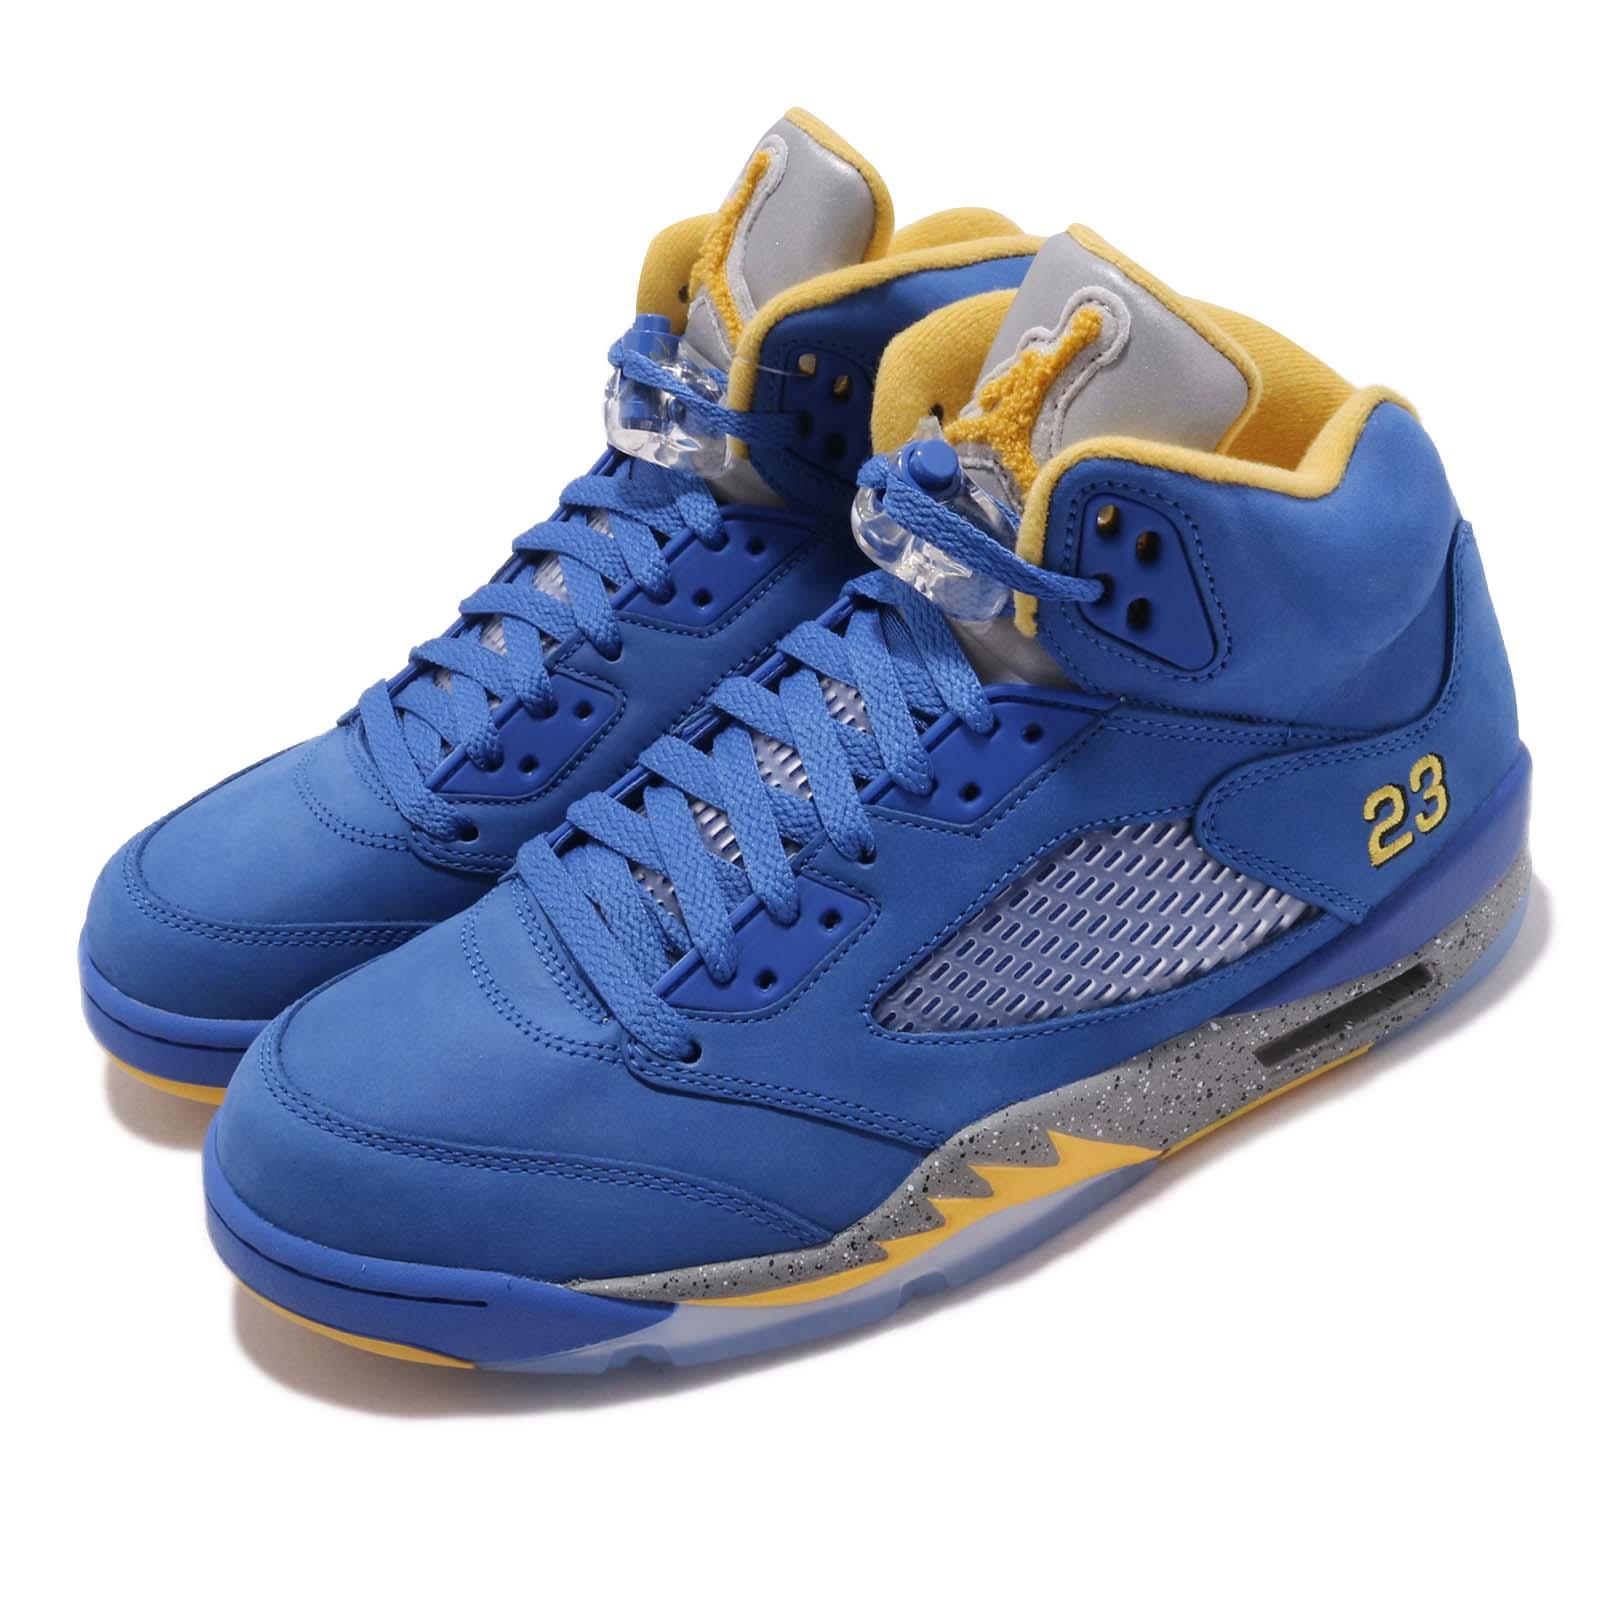 Nike 籃球鞋 Air Jordan 5 經典 男鞋 CD2720-400